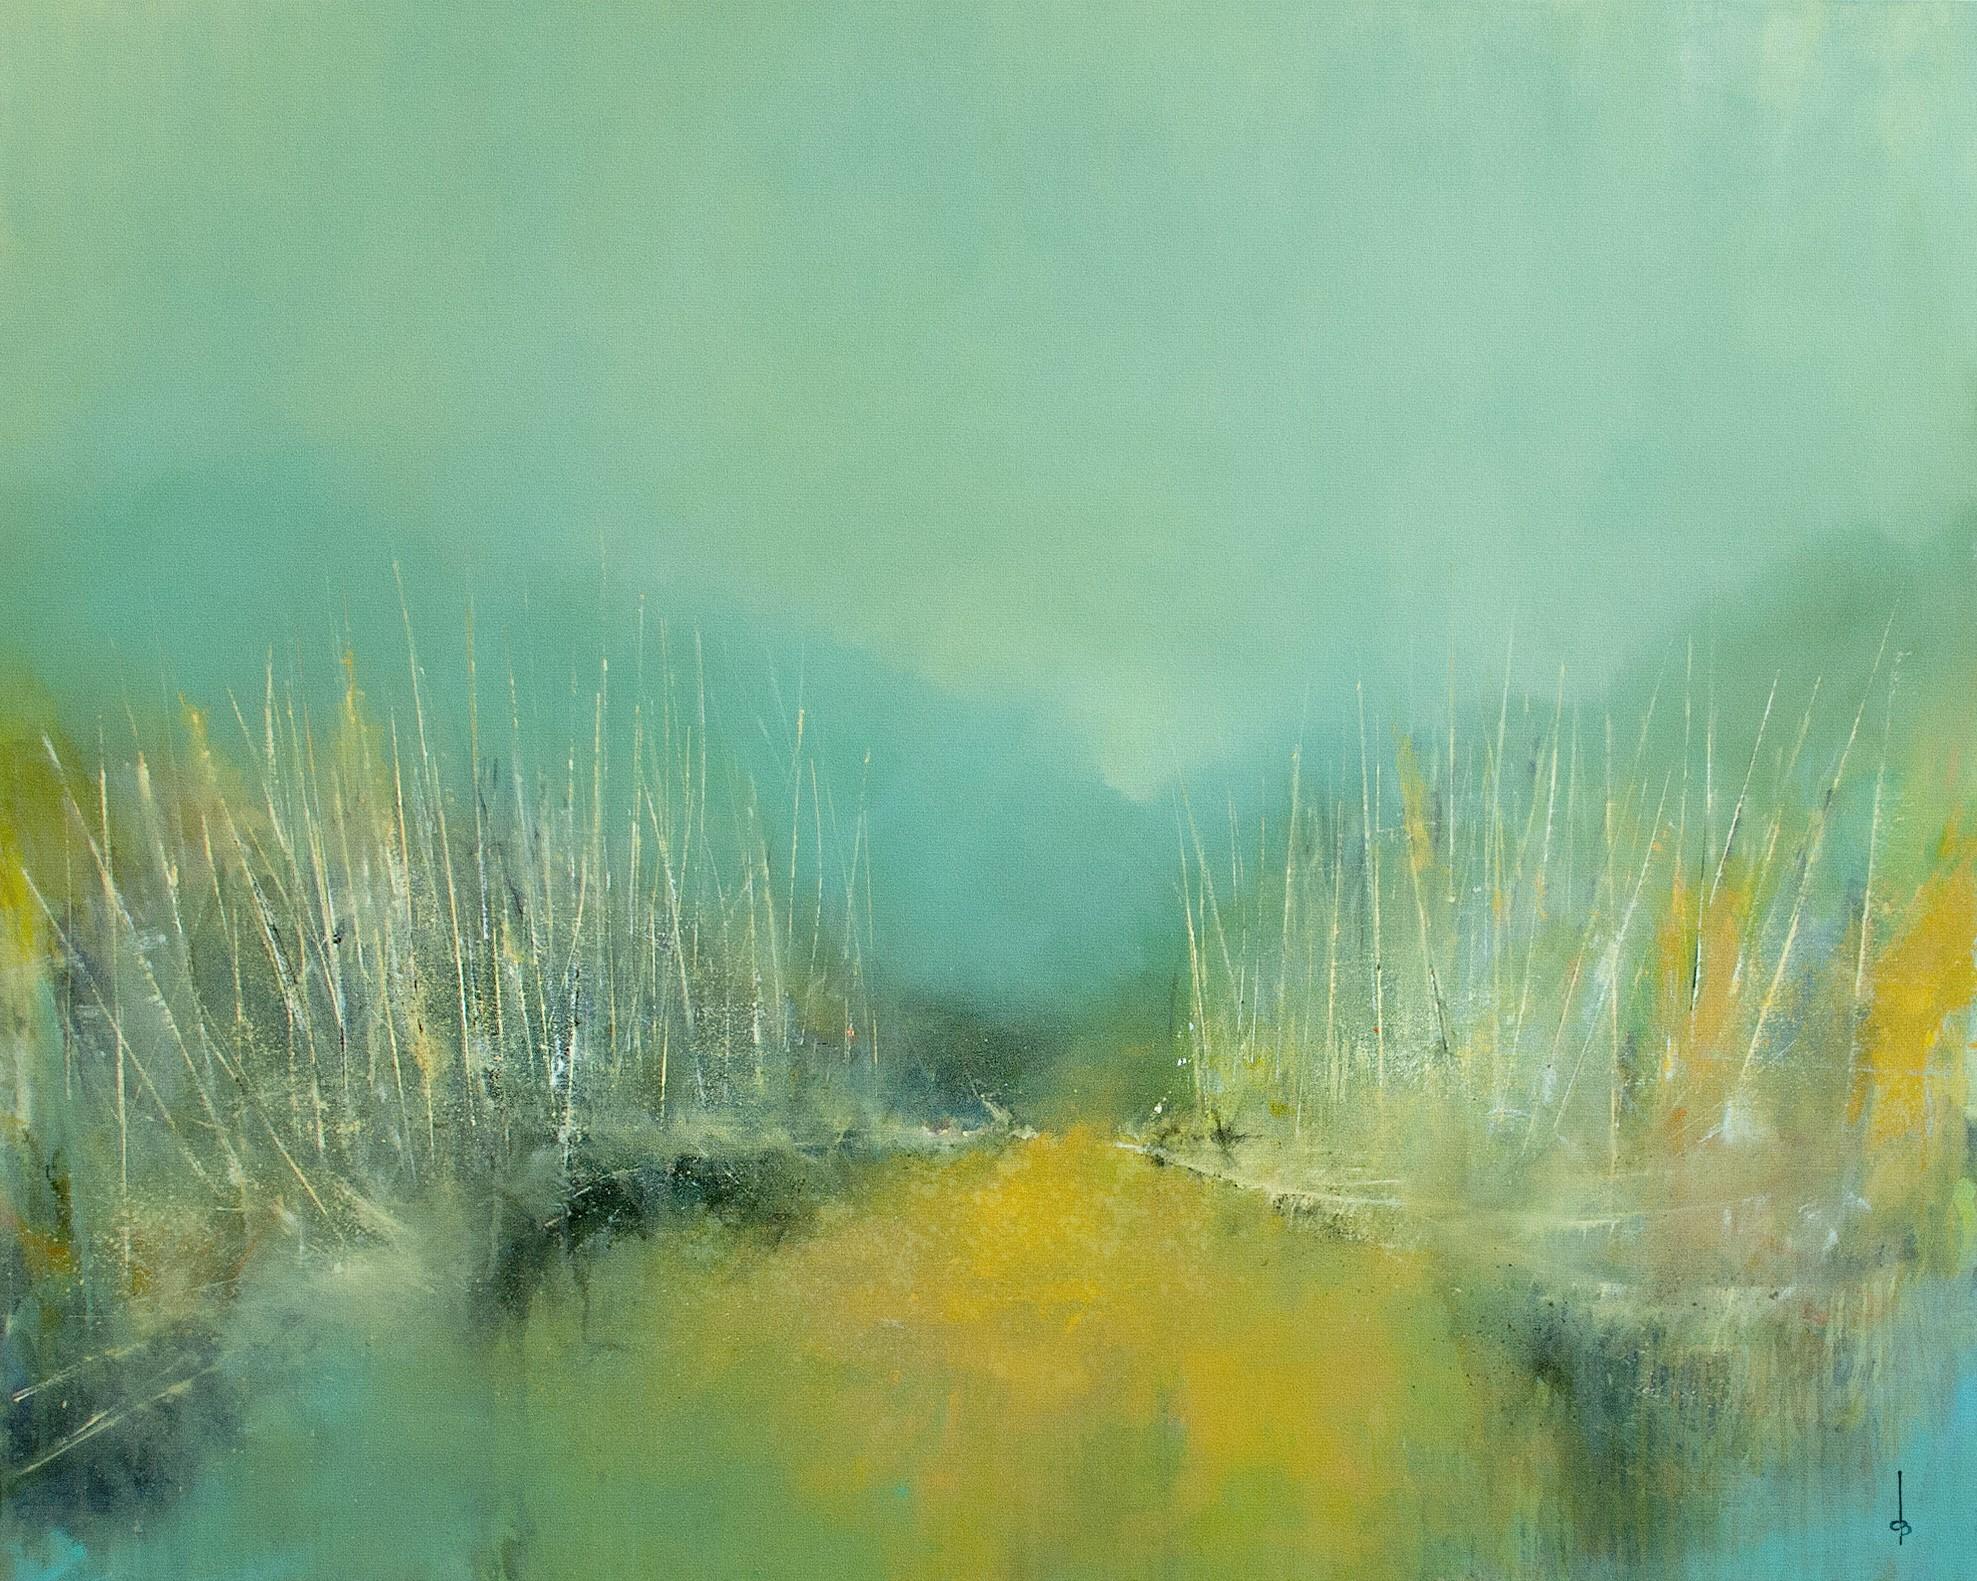 Derrick Breidenthal  Covered  oil on canvas  48x60